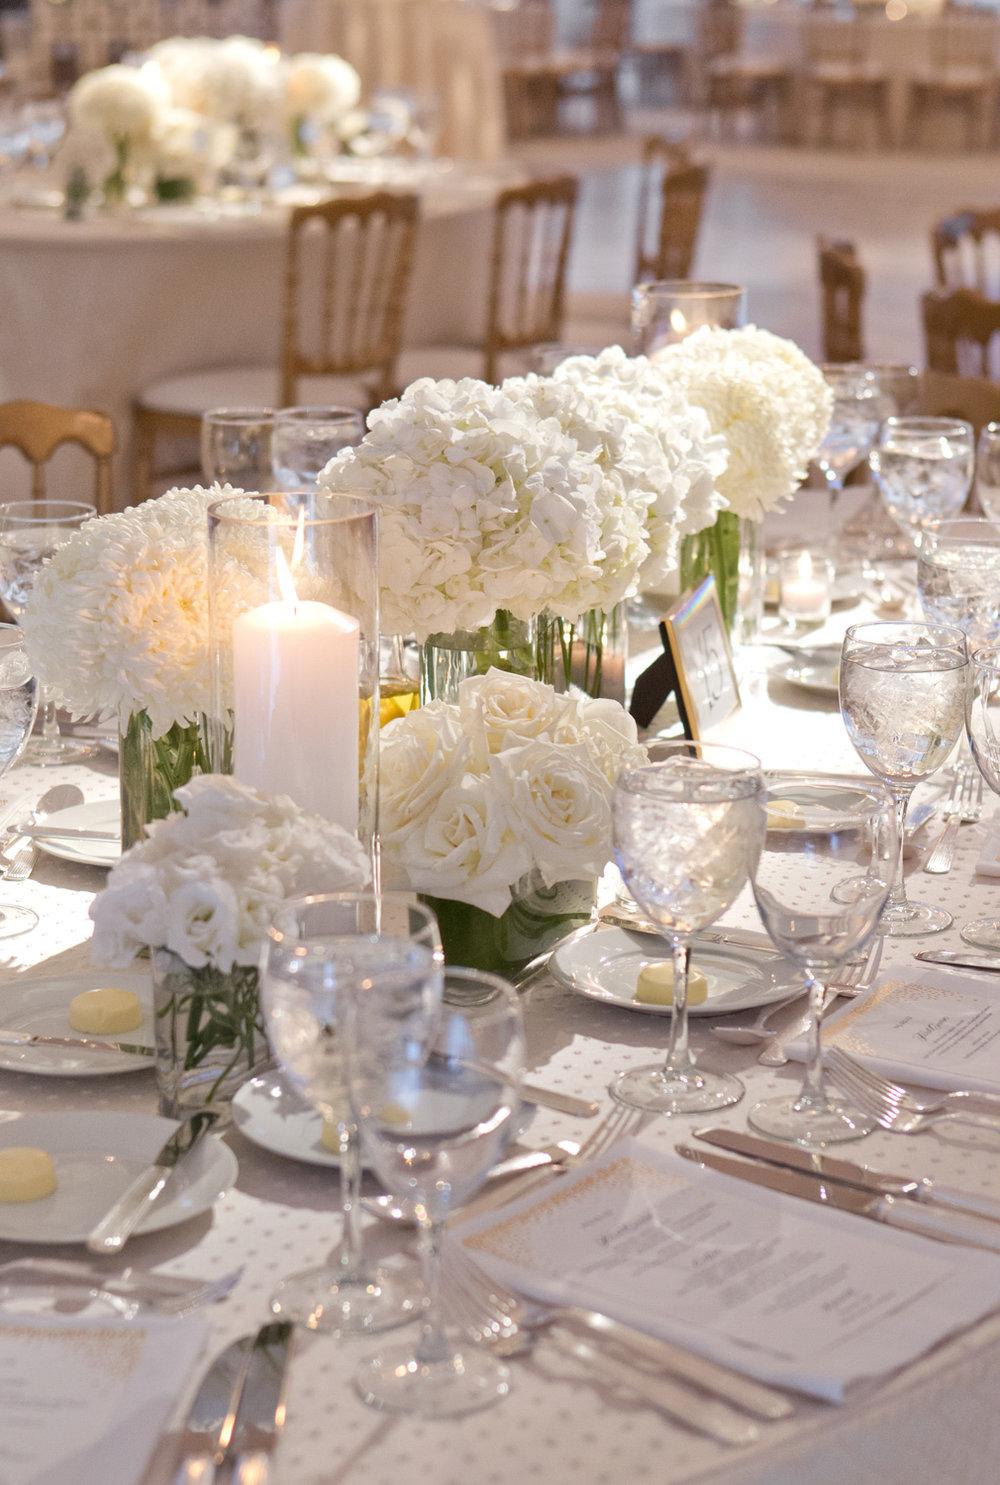 birch-bespoke-events-and-weddings-9.jpg